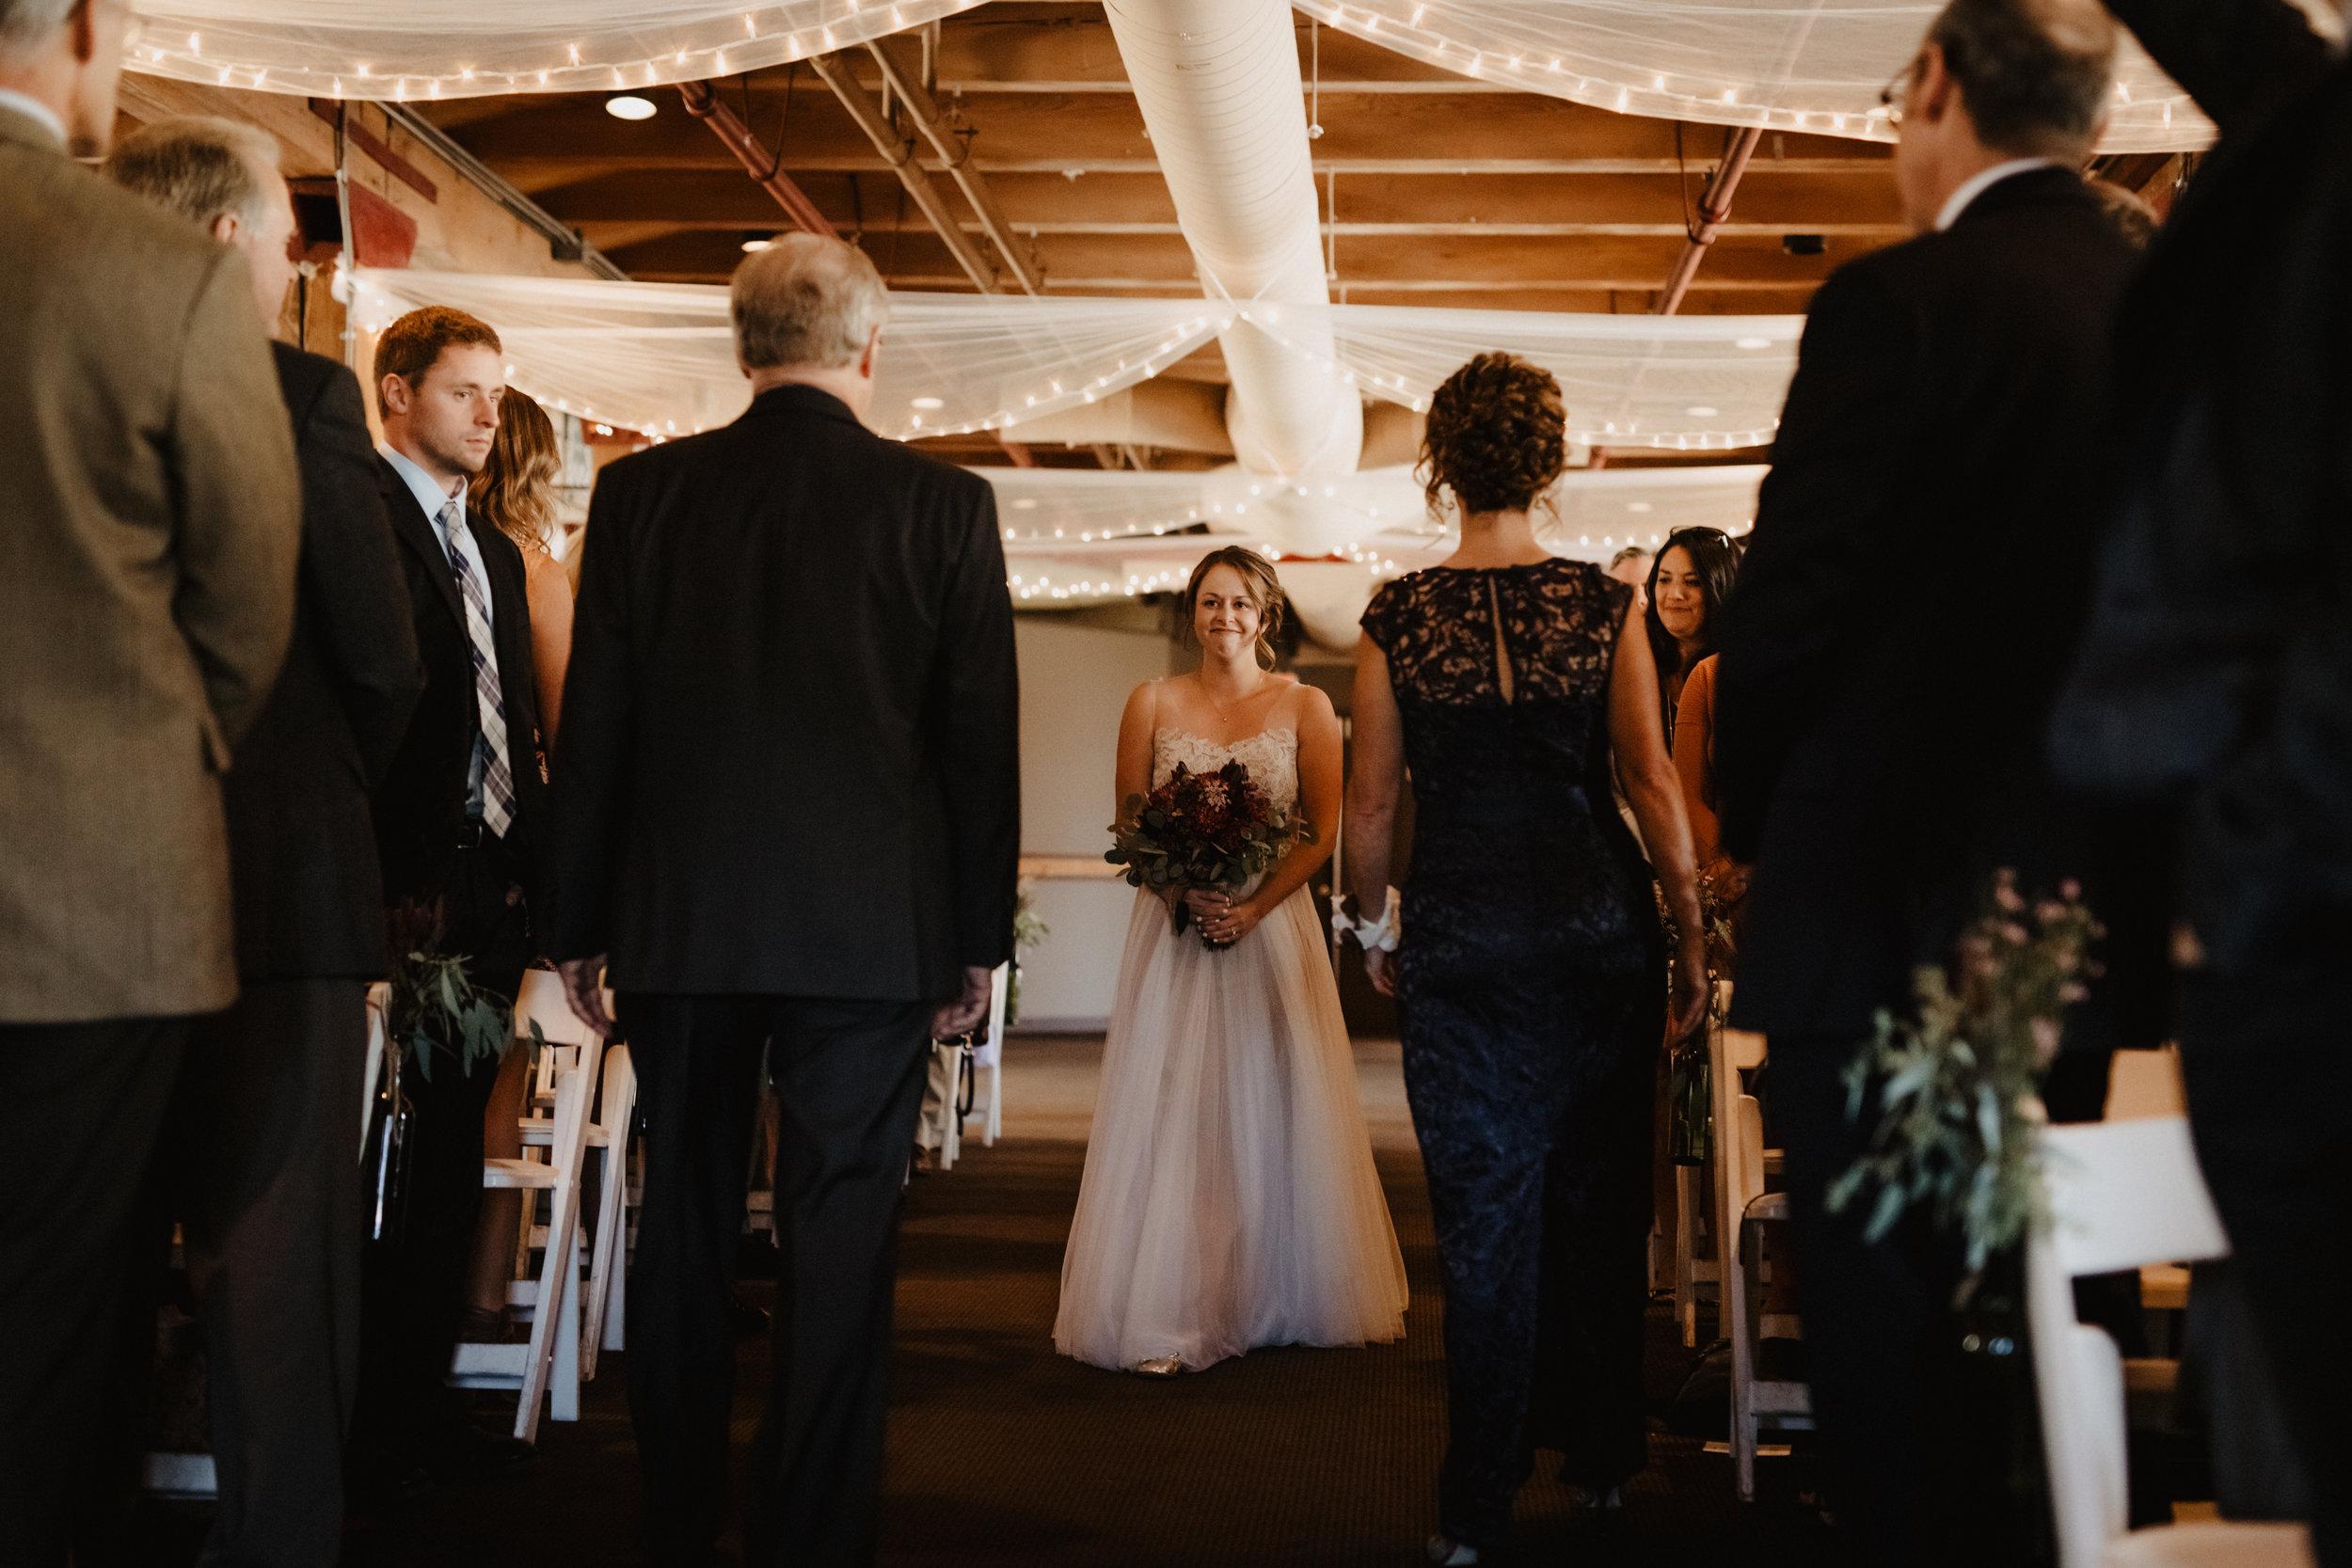 Smiling-Bride-Wedding-Day-01